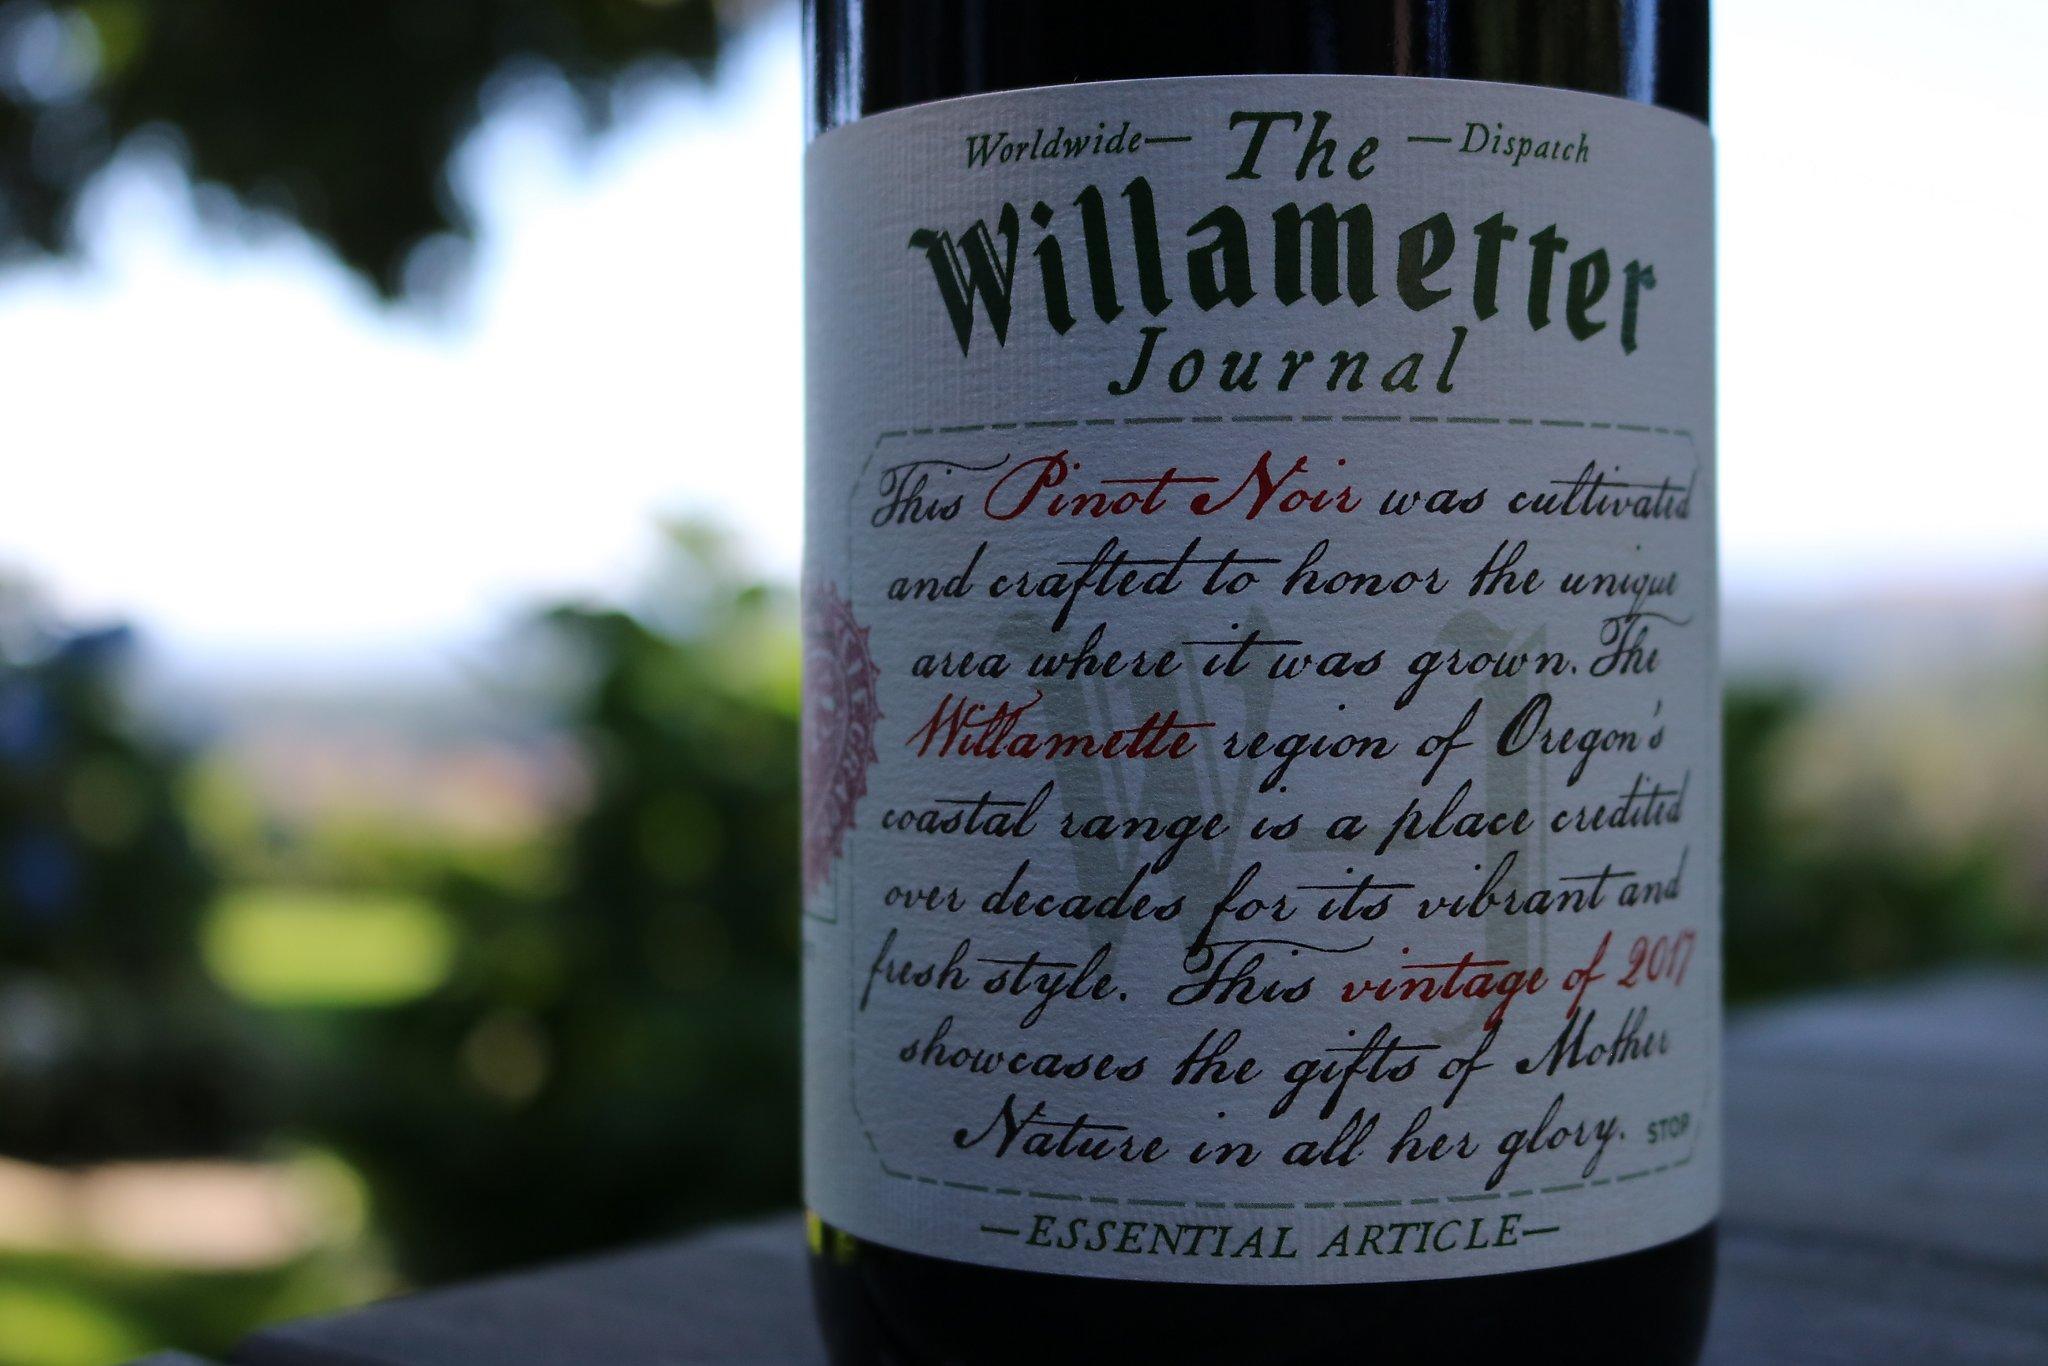 Dark side of wine labeling: A California winemaker's Oregon